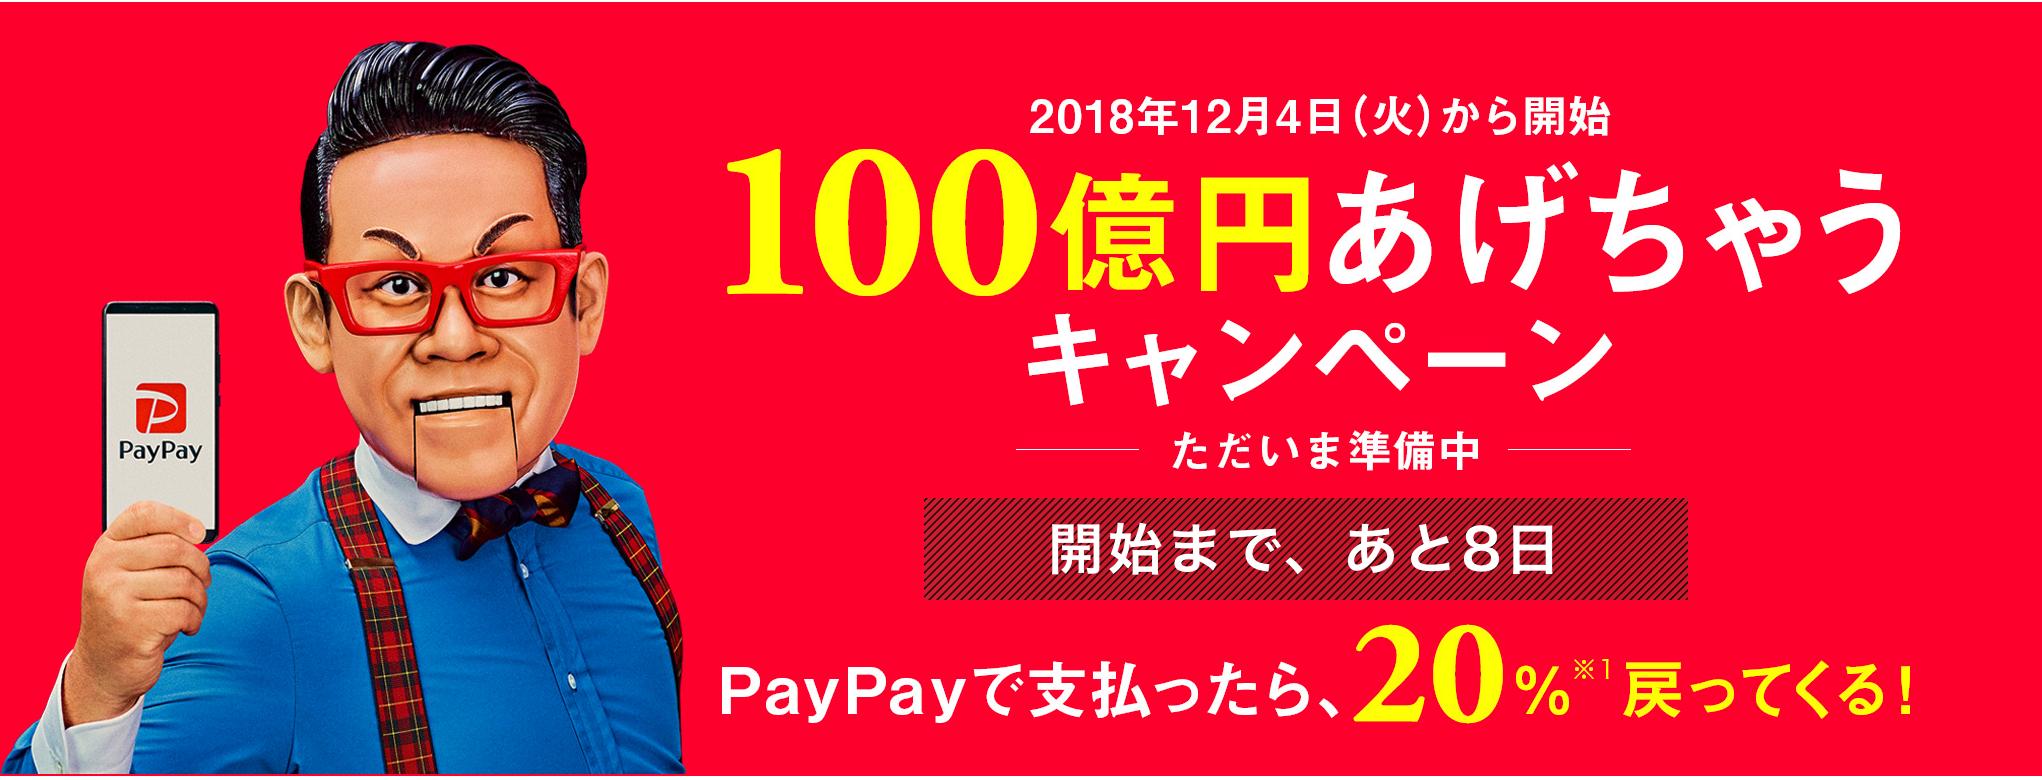 PayPay20percentoff